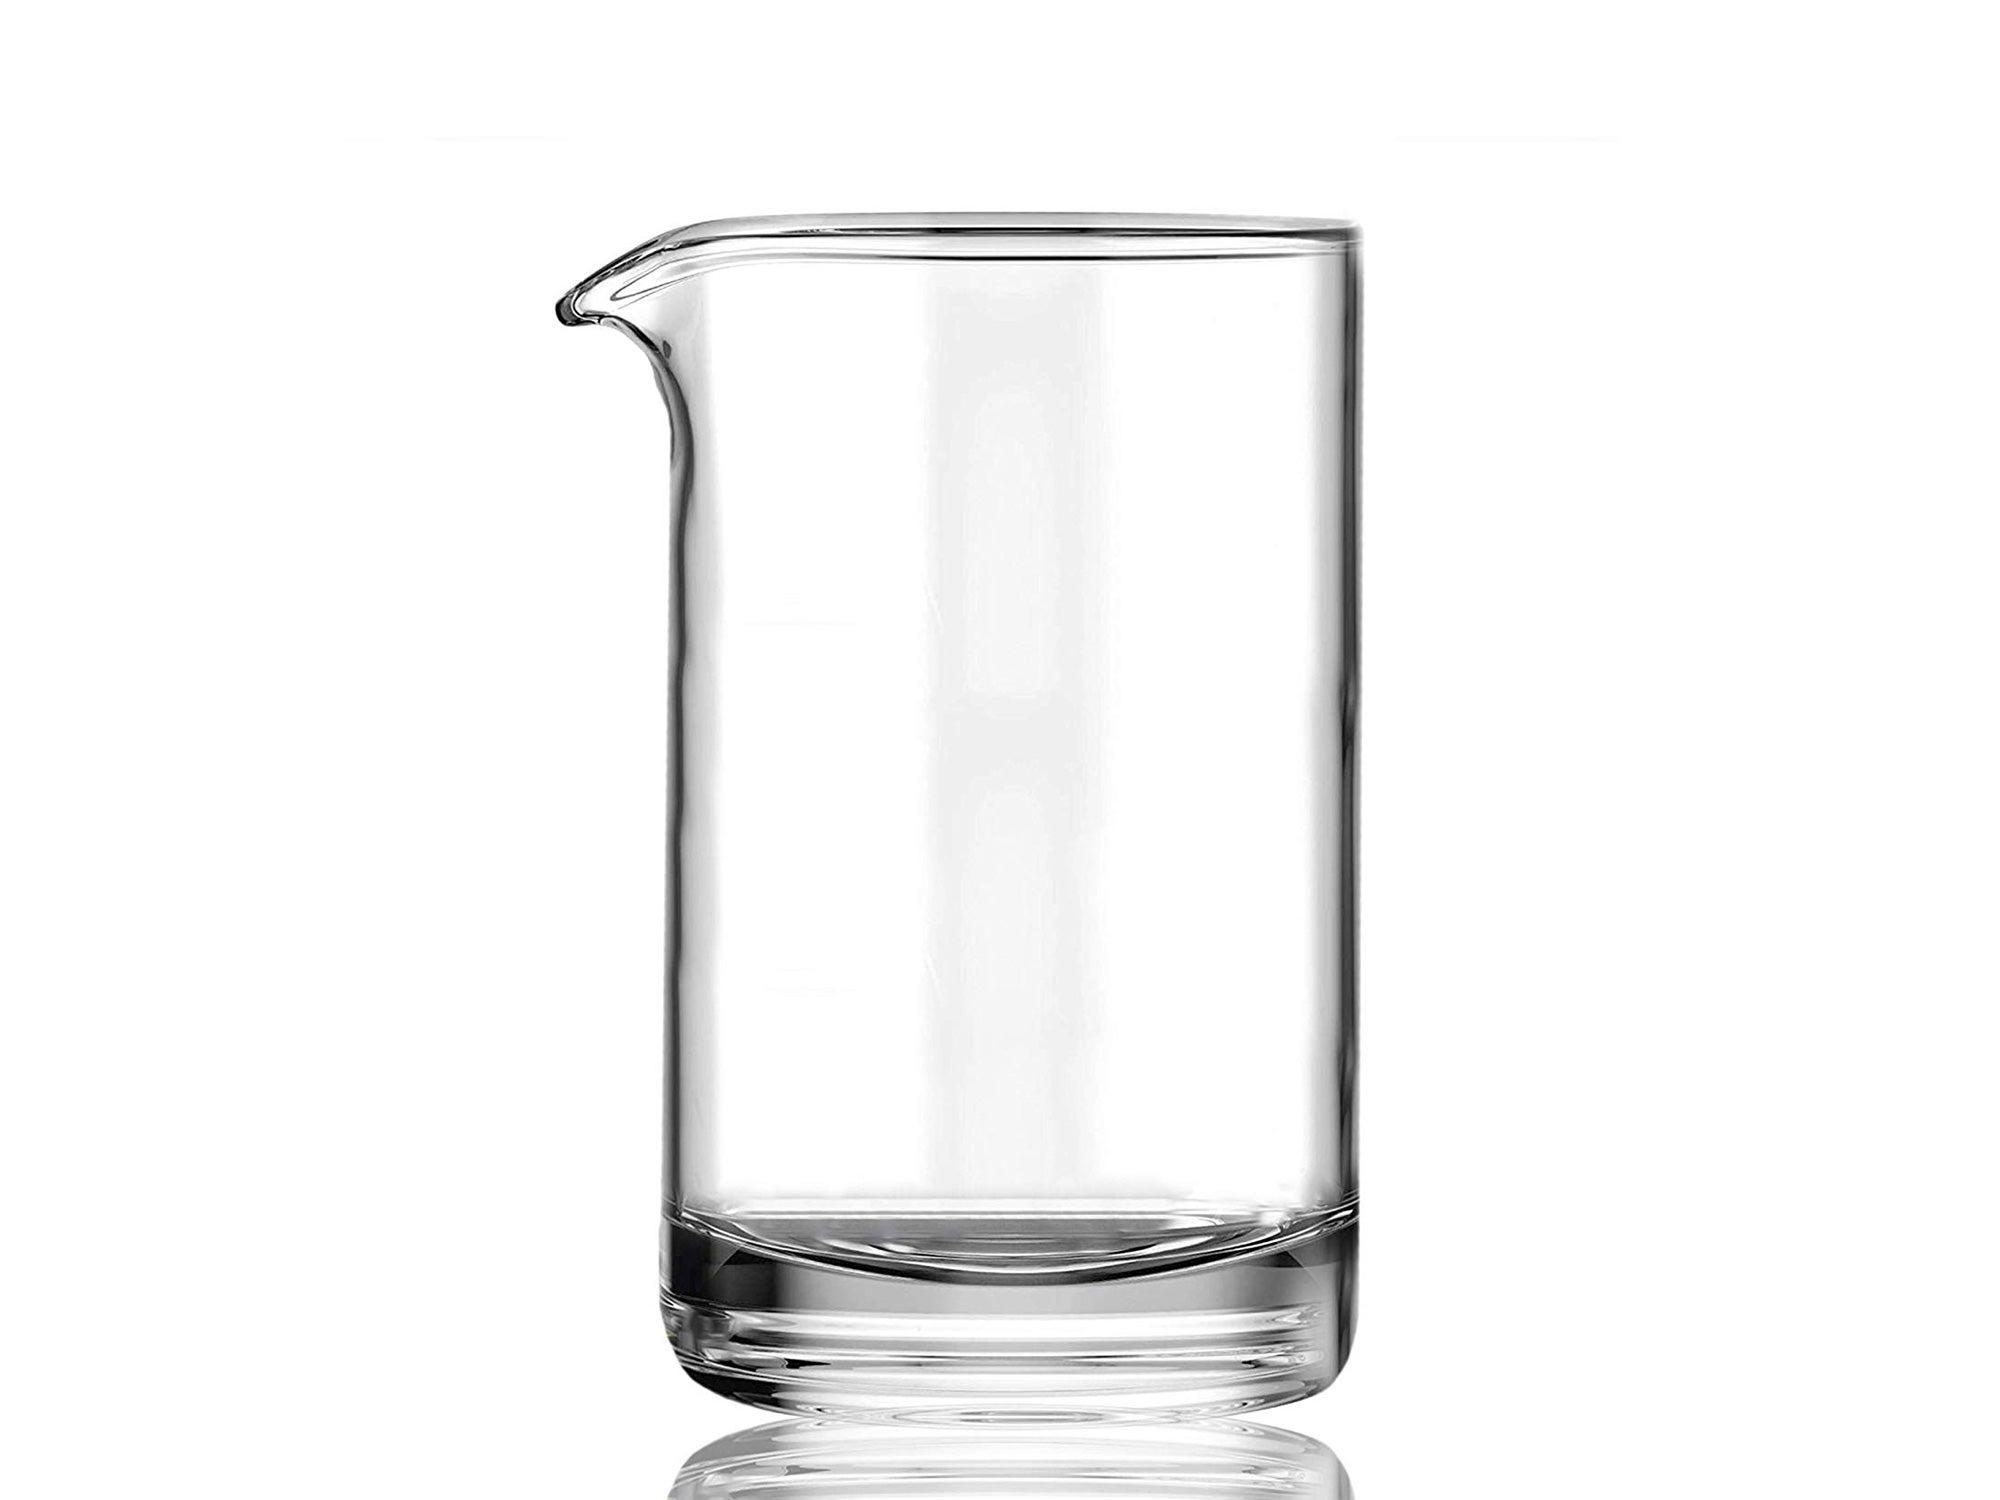 httpspush.saveur.comsitessaveur.comfilesimages201910cocktail-kingdom-seamless-handblown-mixing-glass.jpg